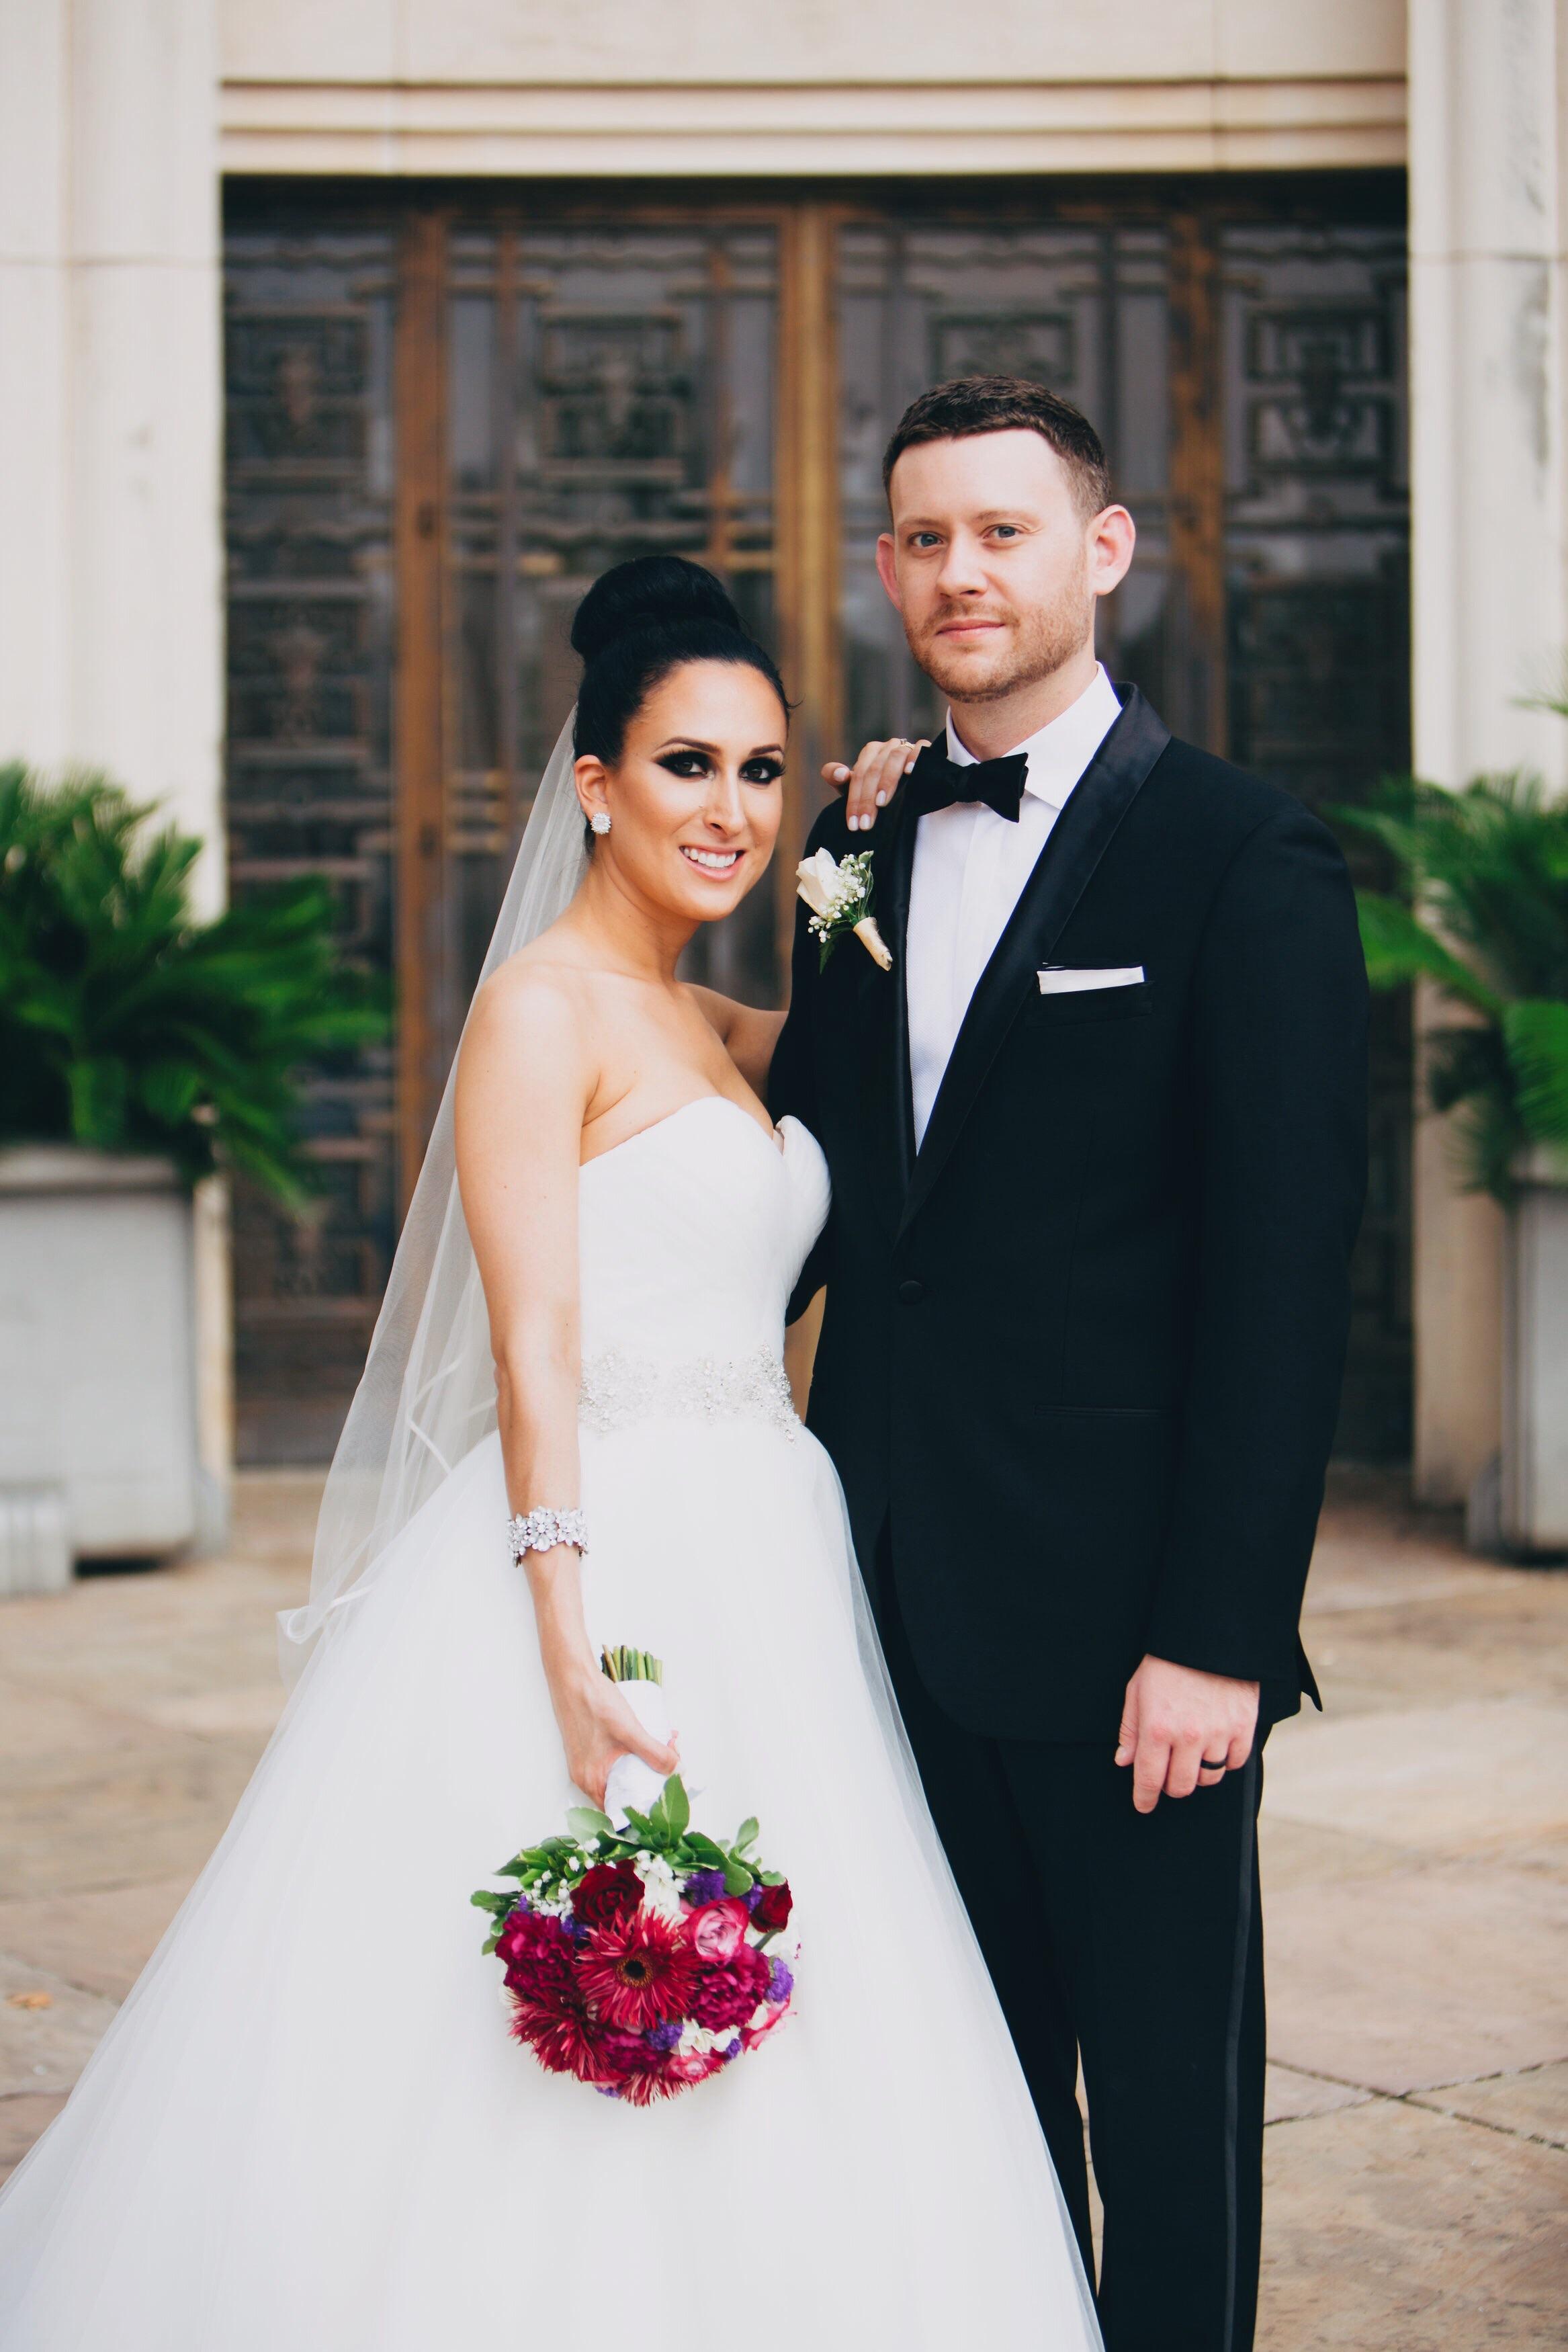 Aubrey Markson + Patrick Peluso Wedding